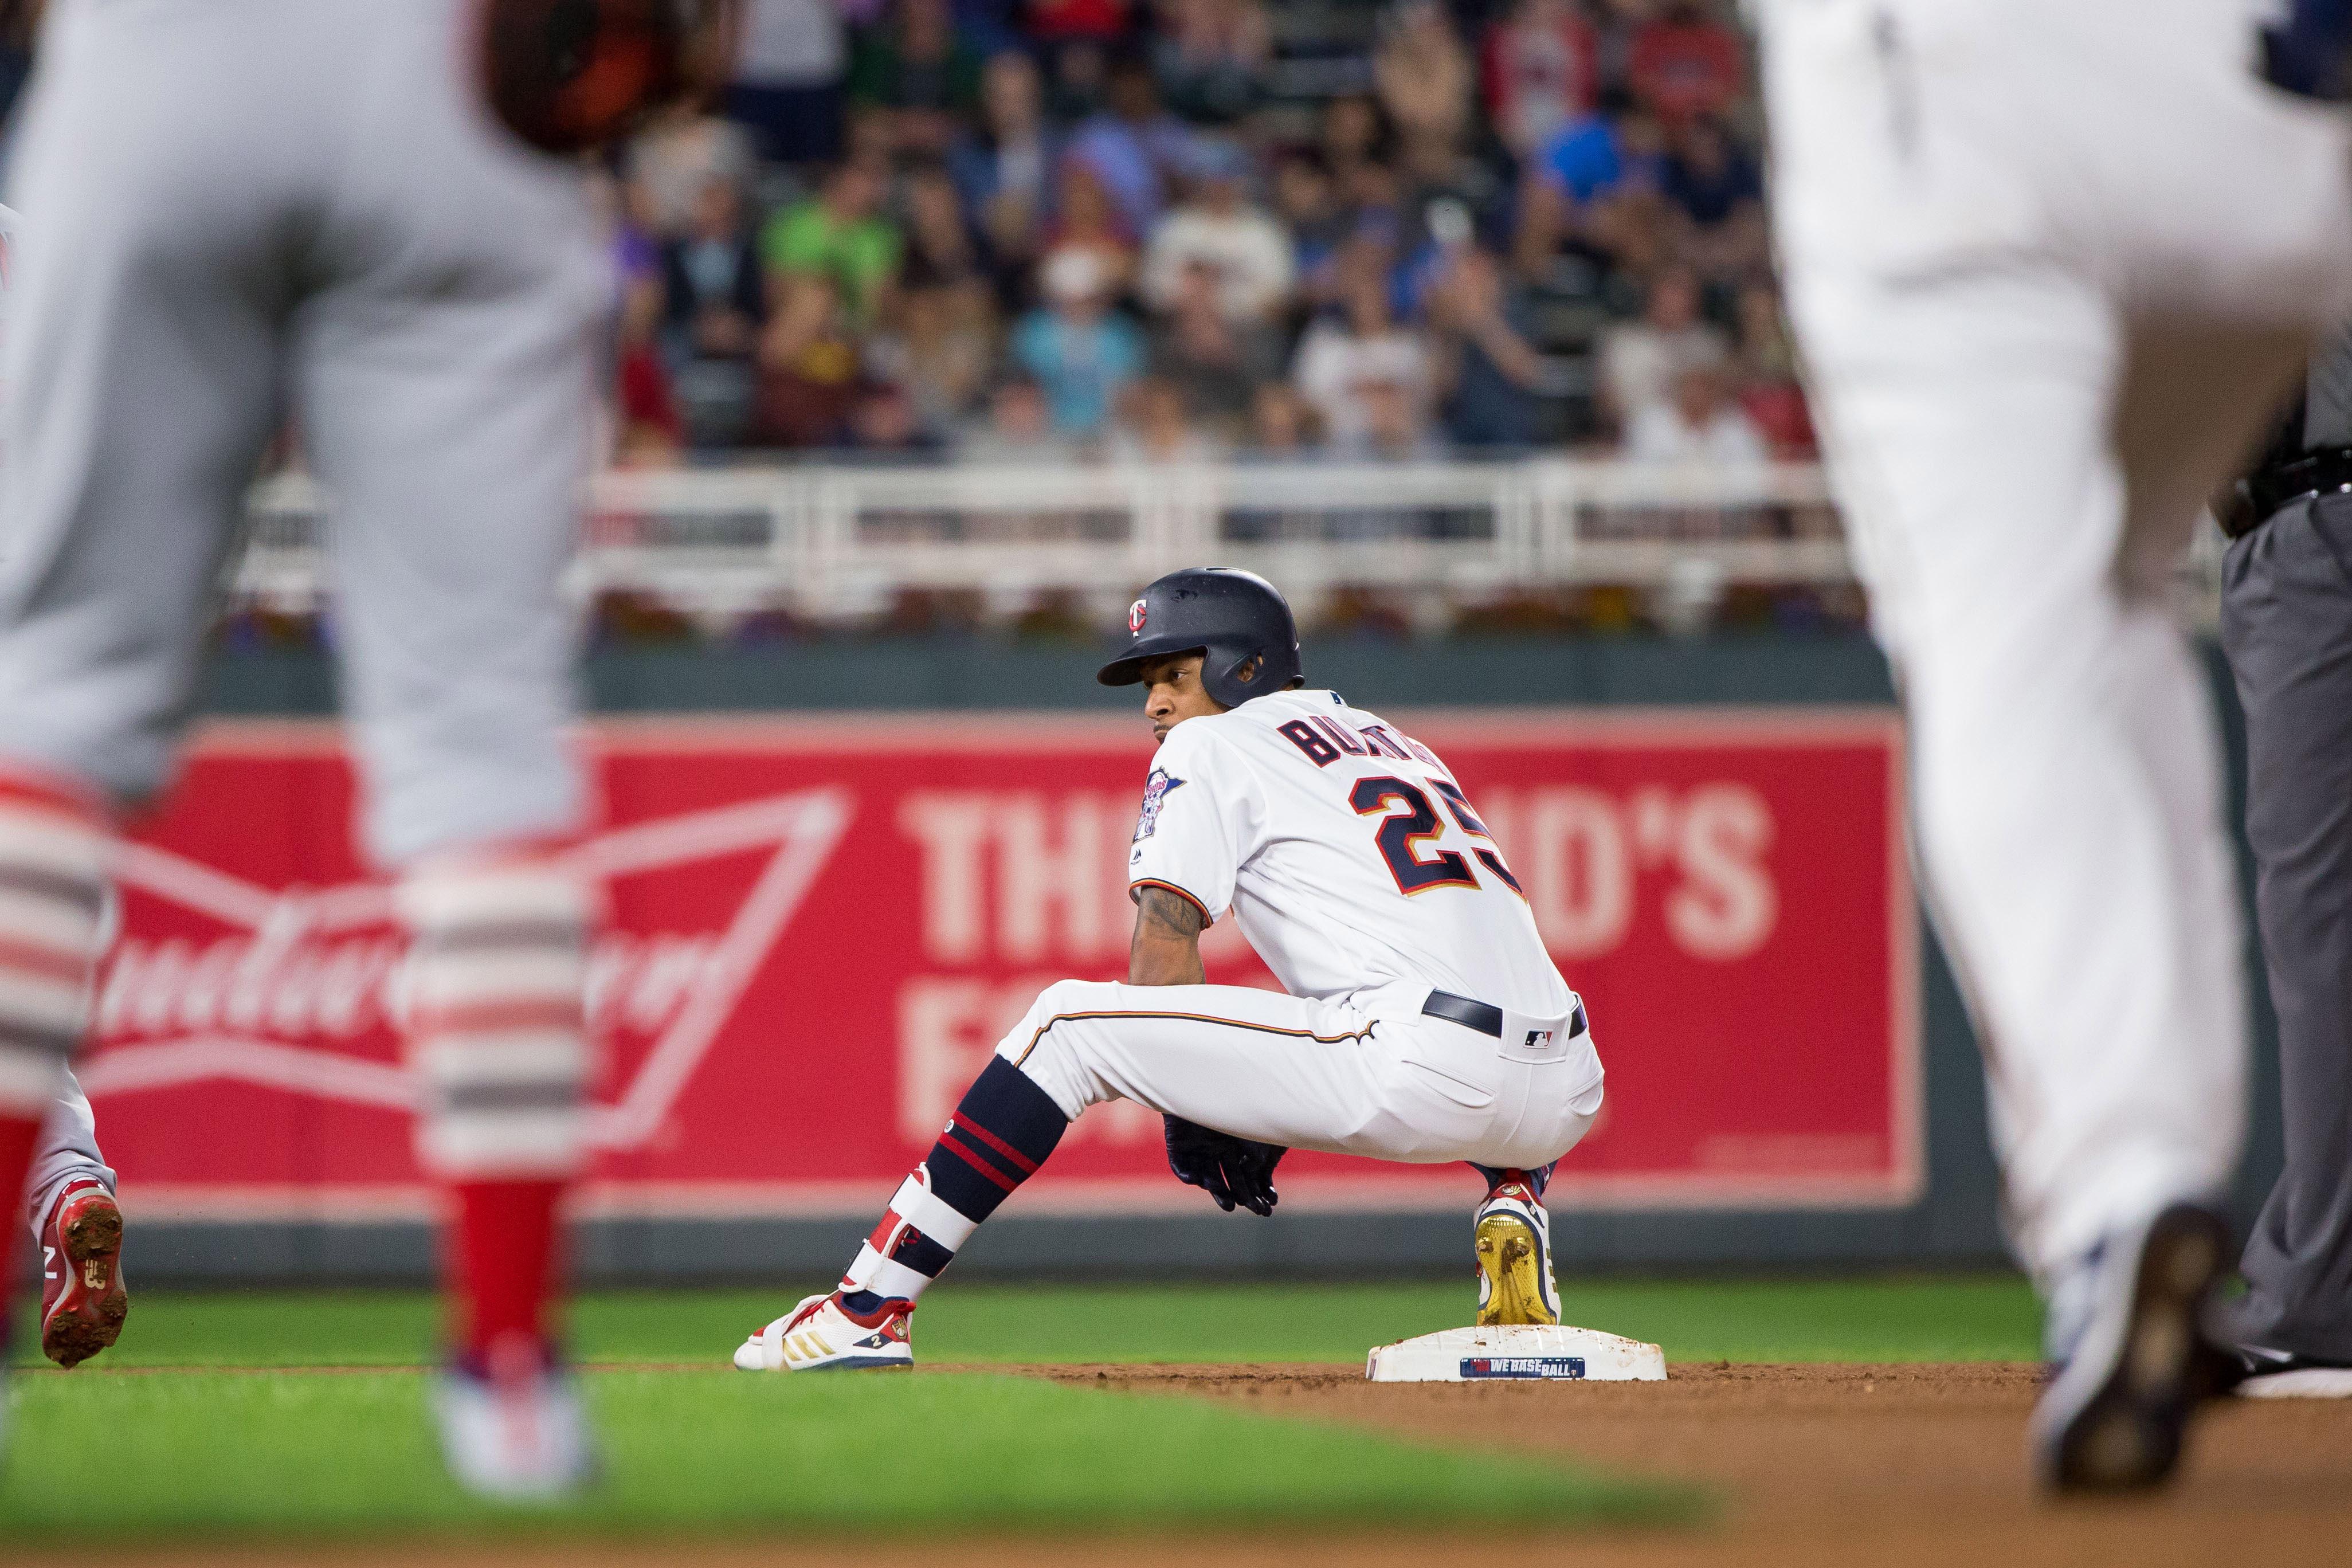 MLB: St. Louis Cardinals at Minnesota Twins